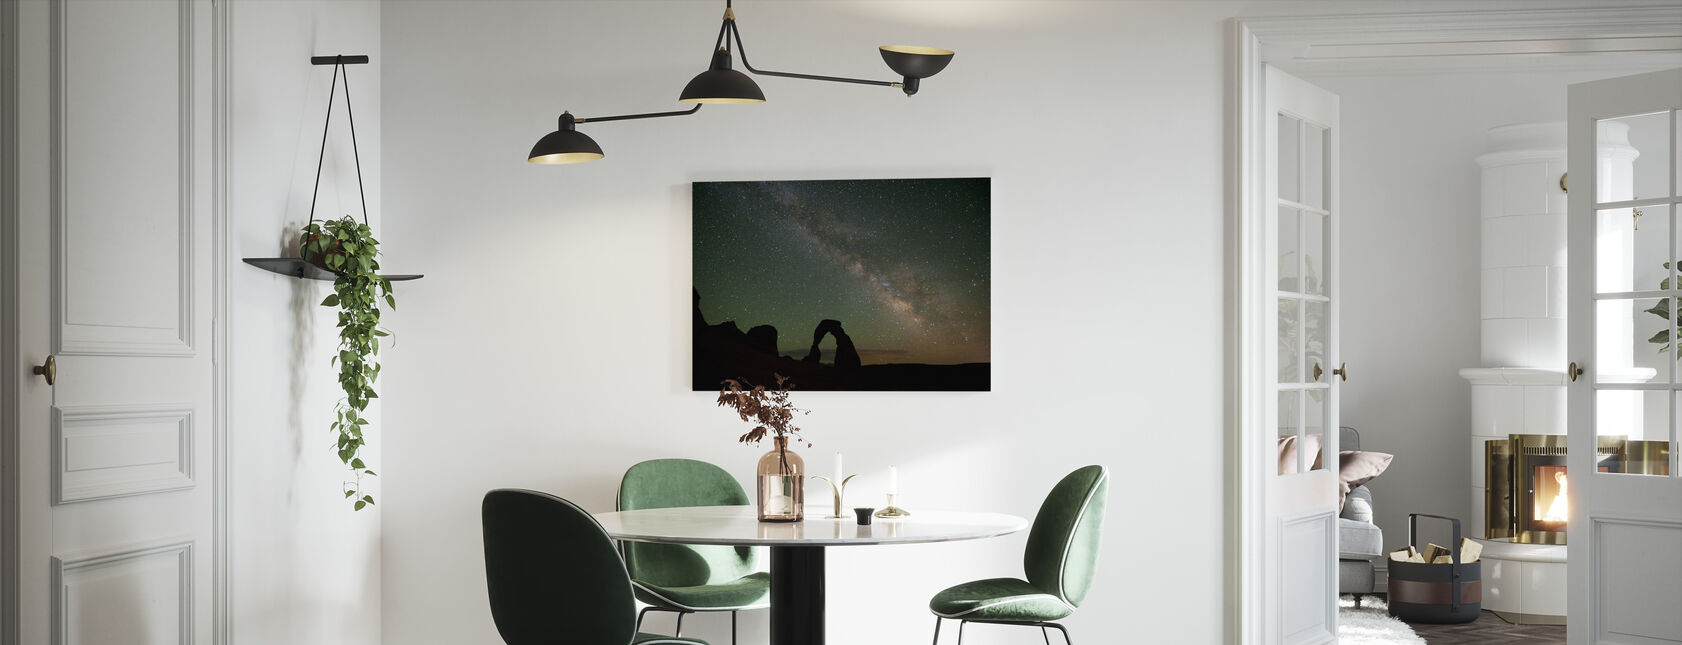 Stenen Boog en de Melkweg - Canvas print - Keuken